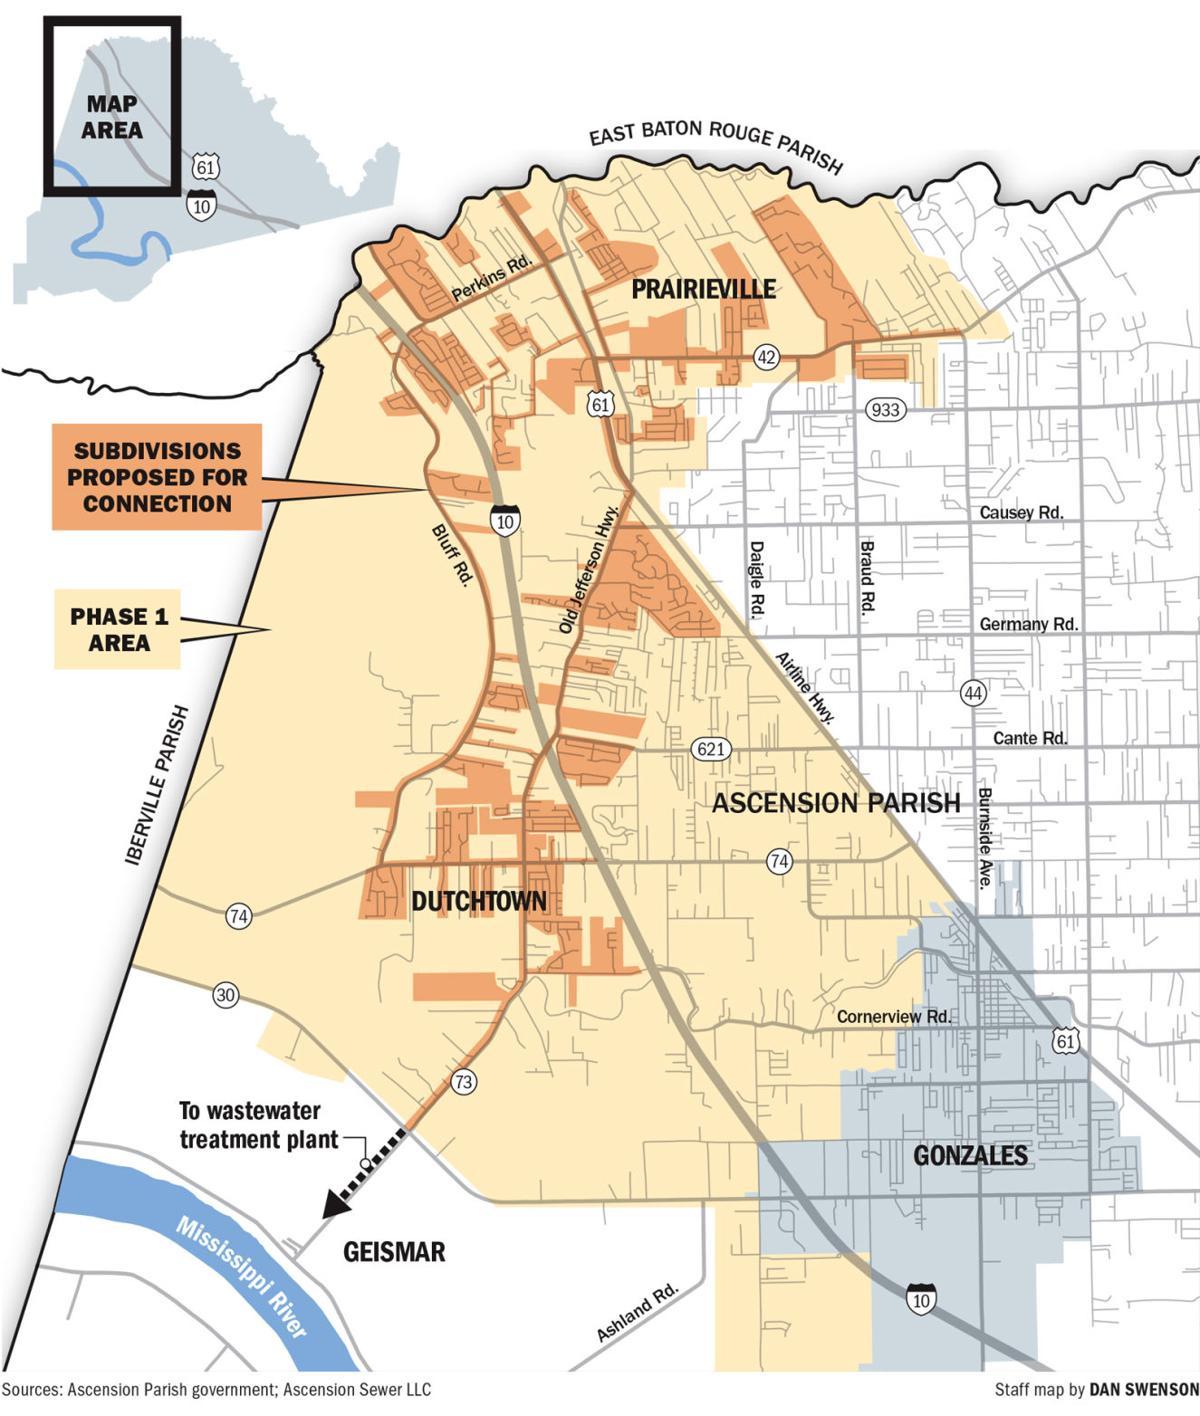 072419 Ascension sewer plan